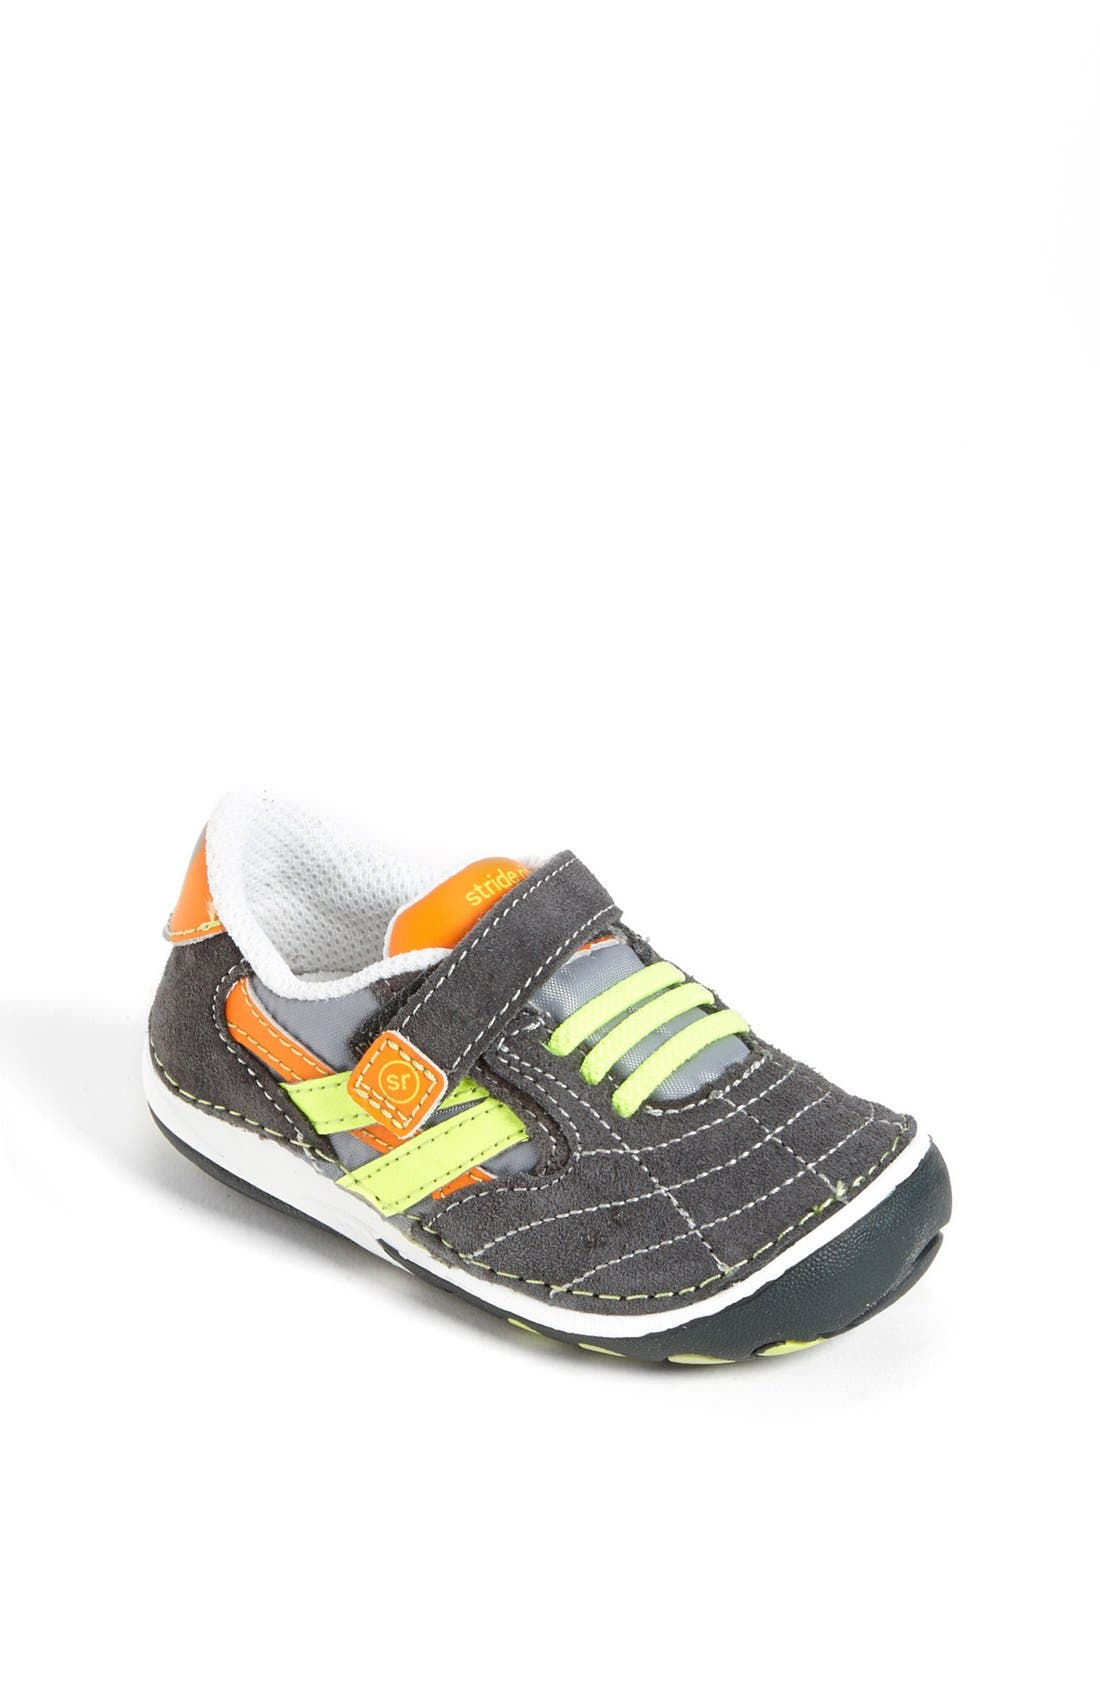 Alternate Image 1 Selected - Stride Rite 'Jason' Sneaker (Baby & Walker)